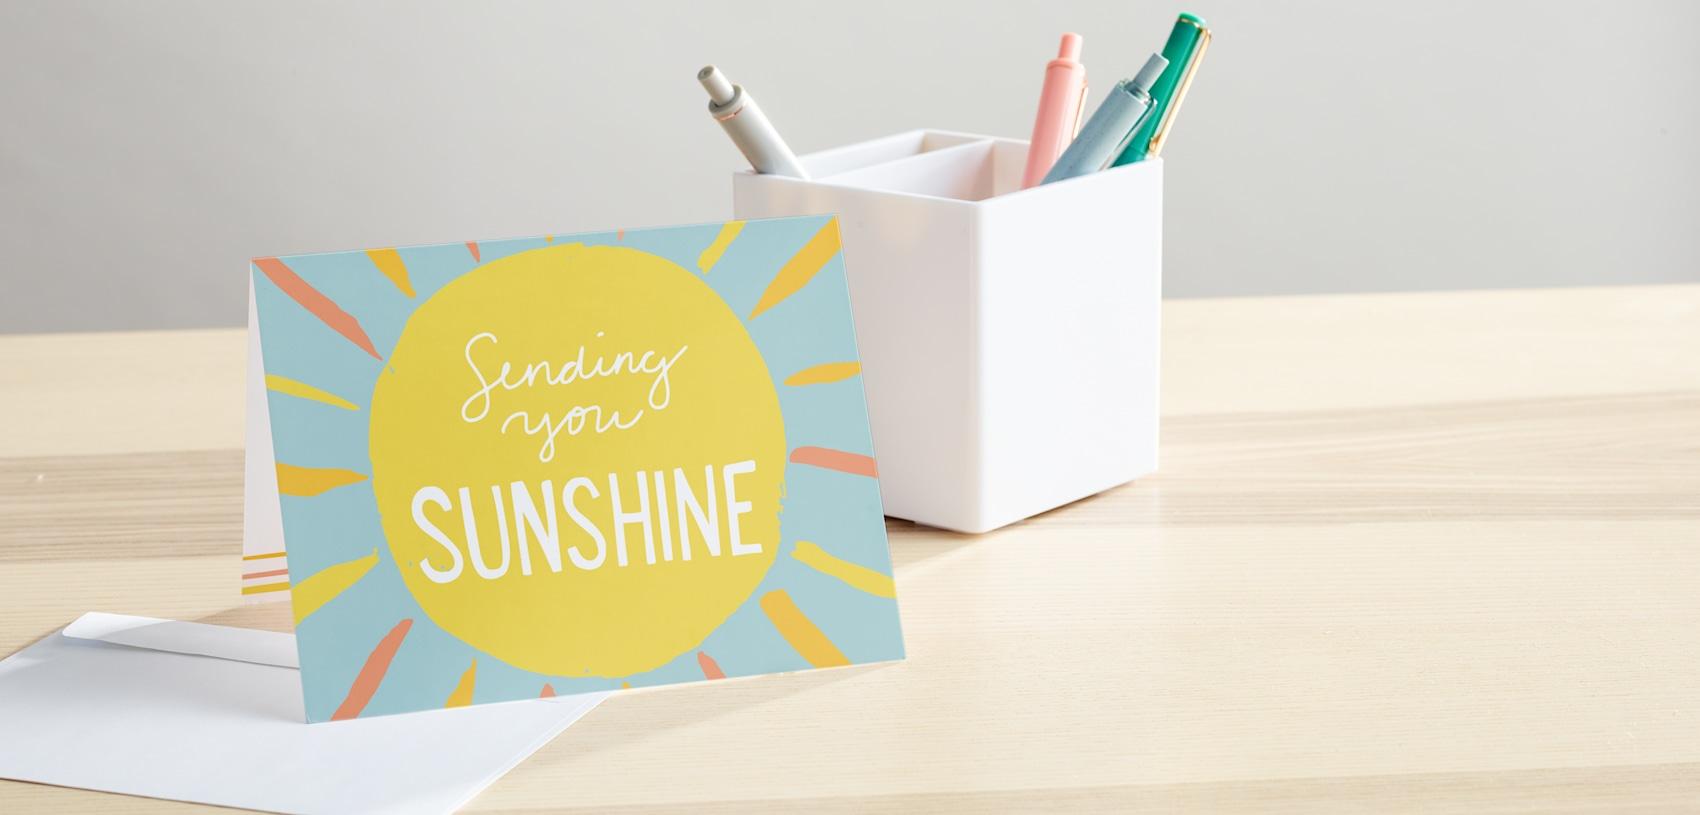 sending you sunshine note card